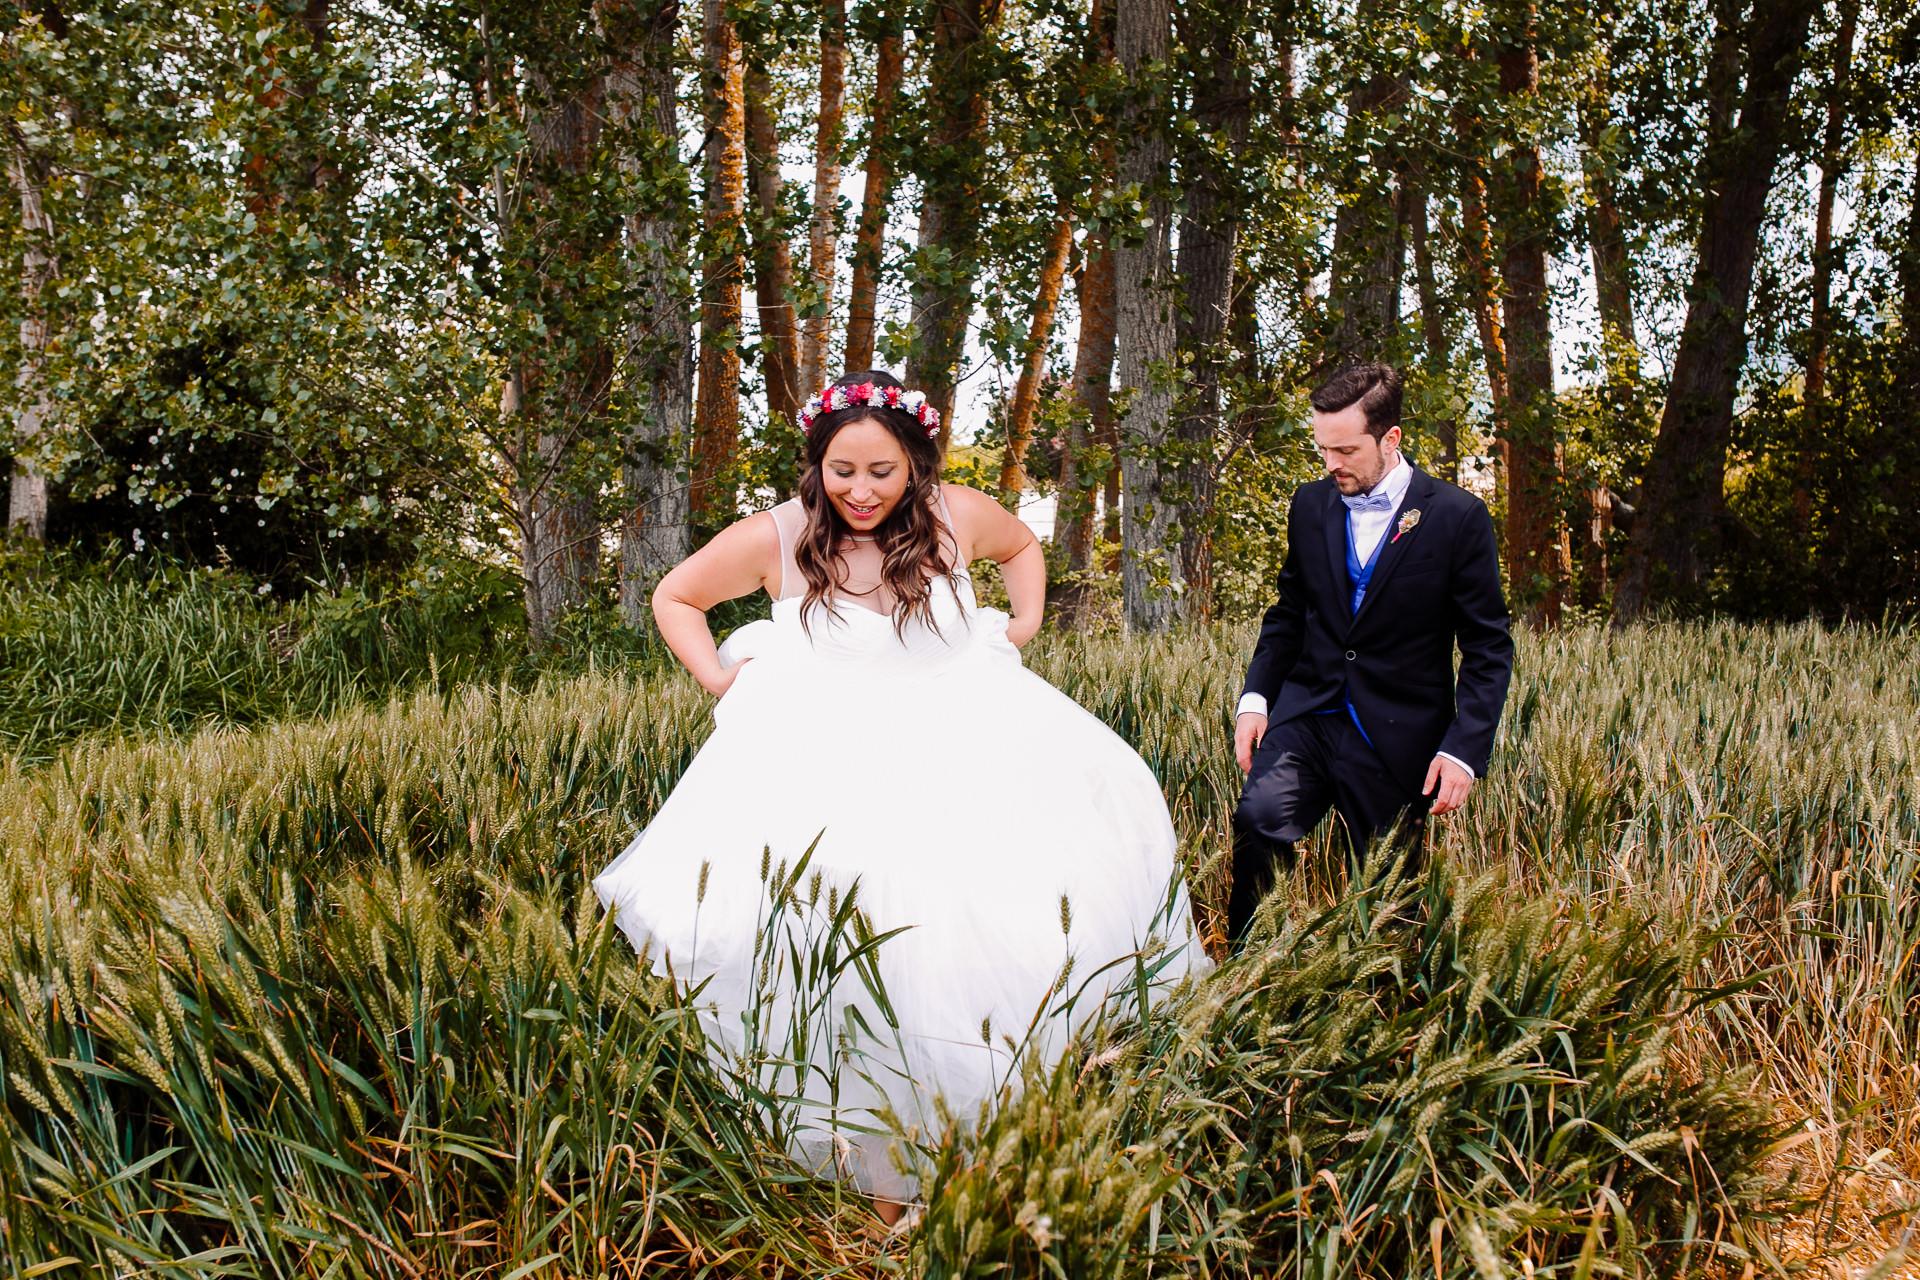 boda civil restaurante lola 140712